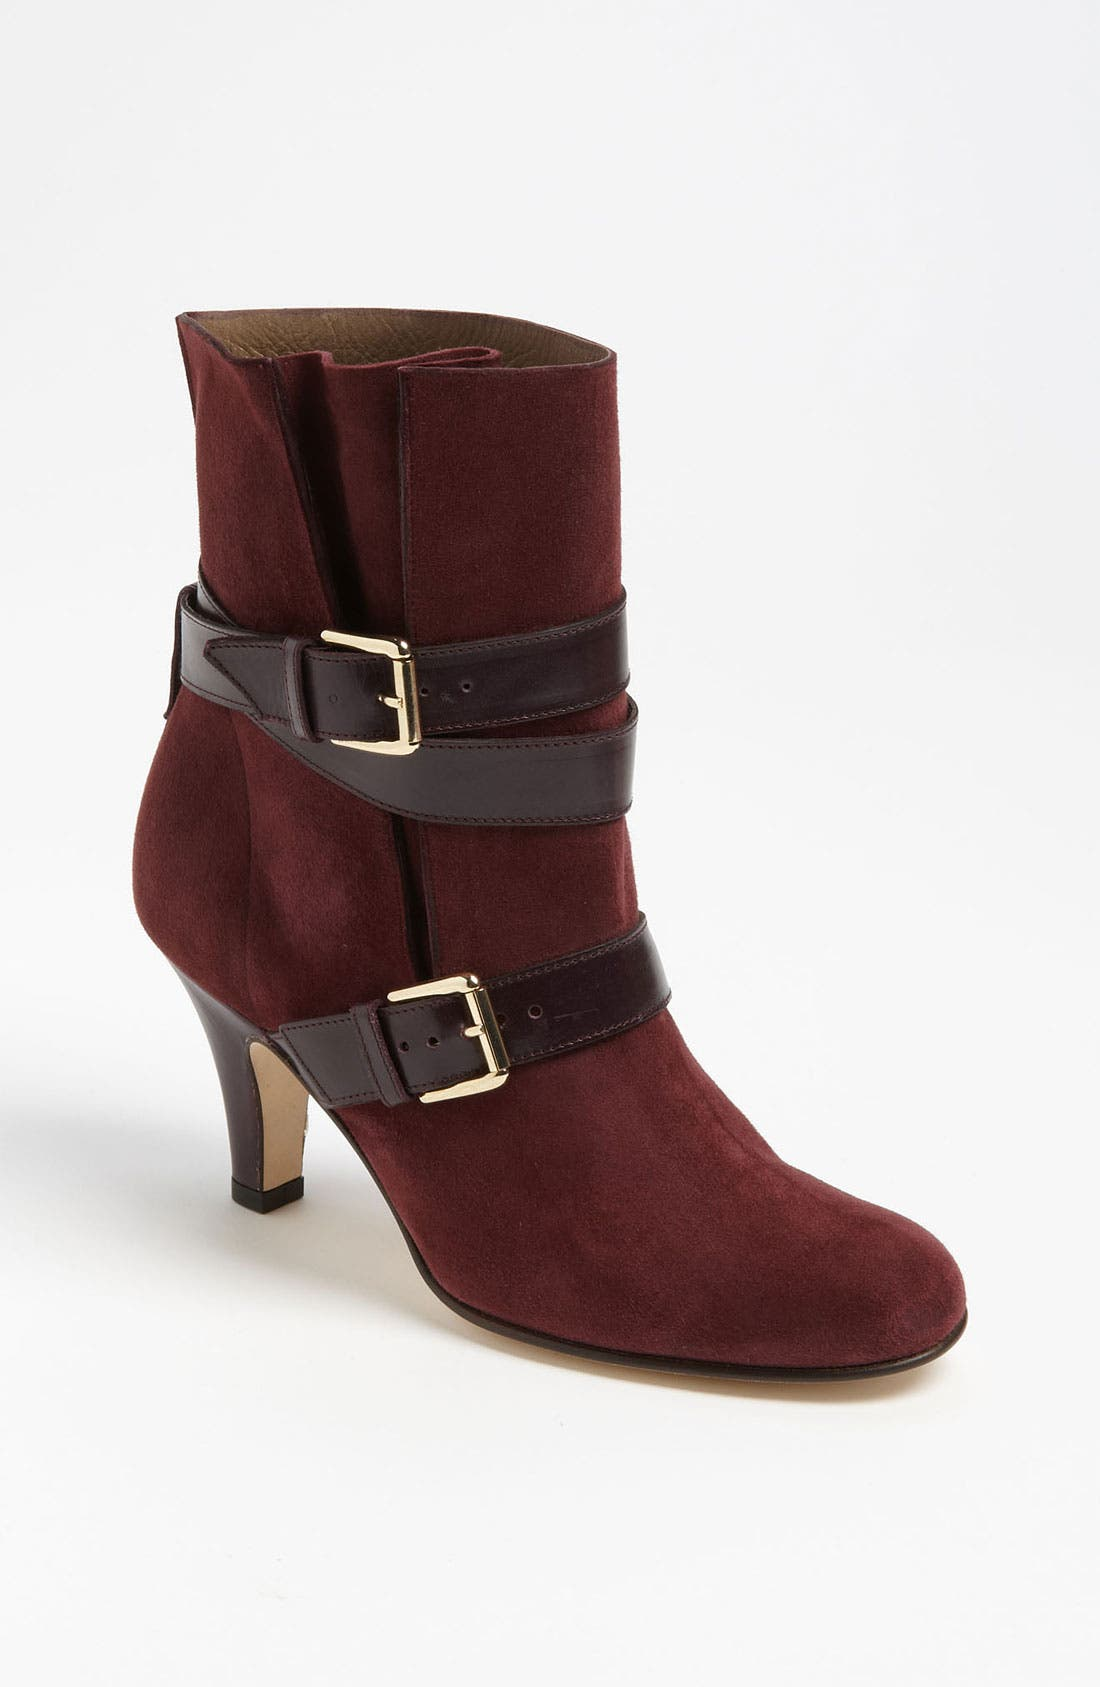 Main Image - Anyi Lu 'Rachel' Boot